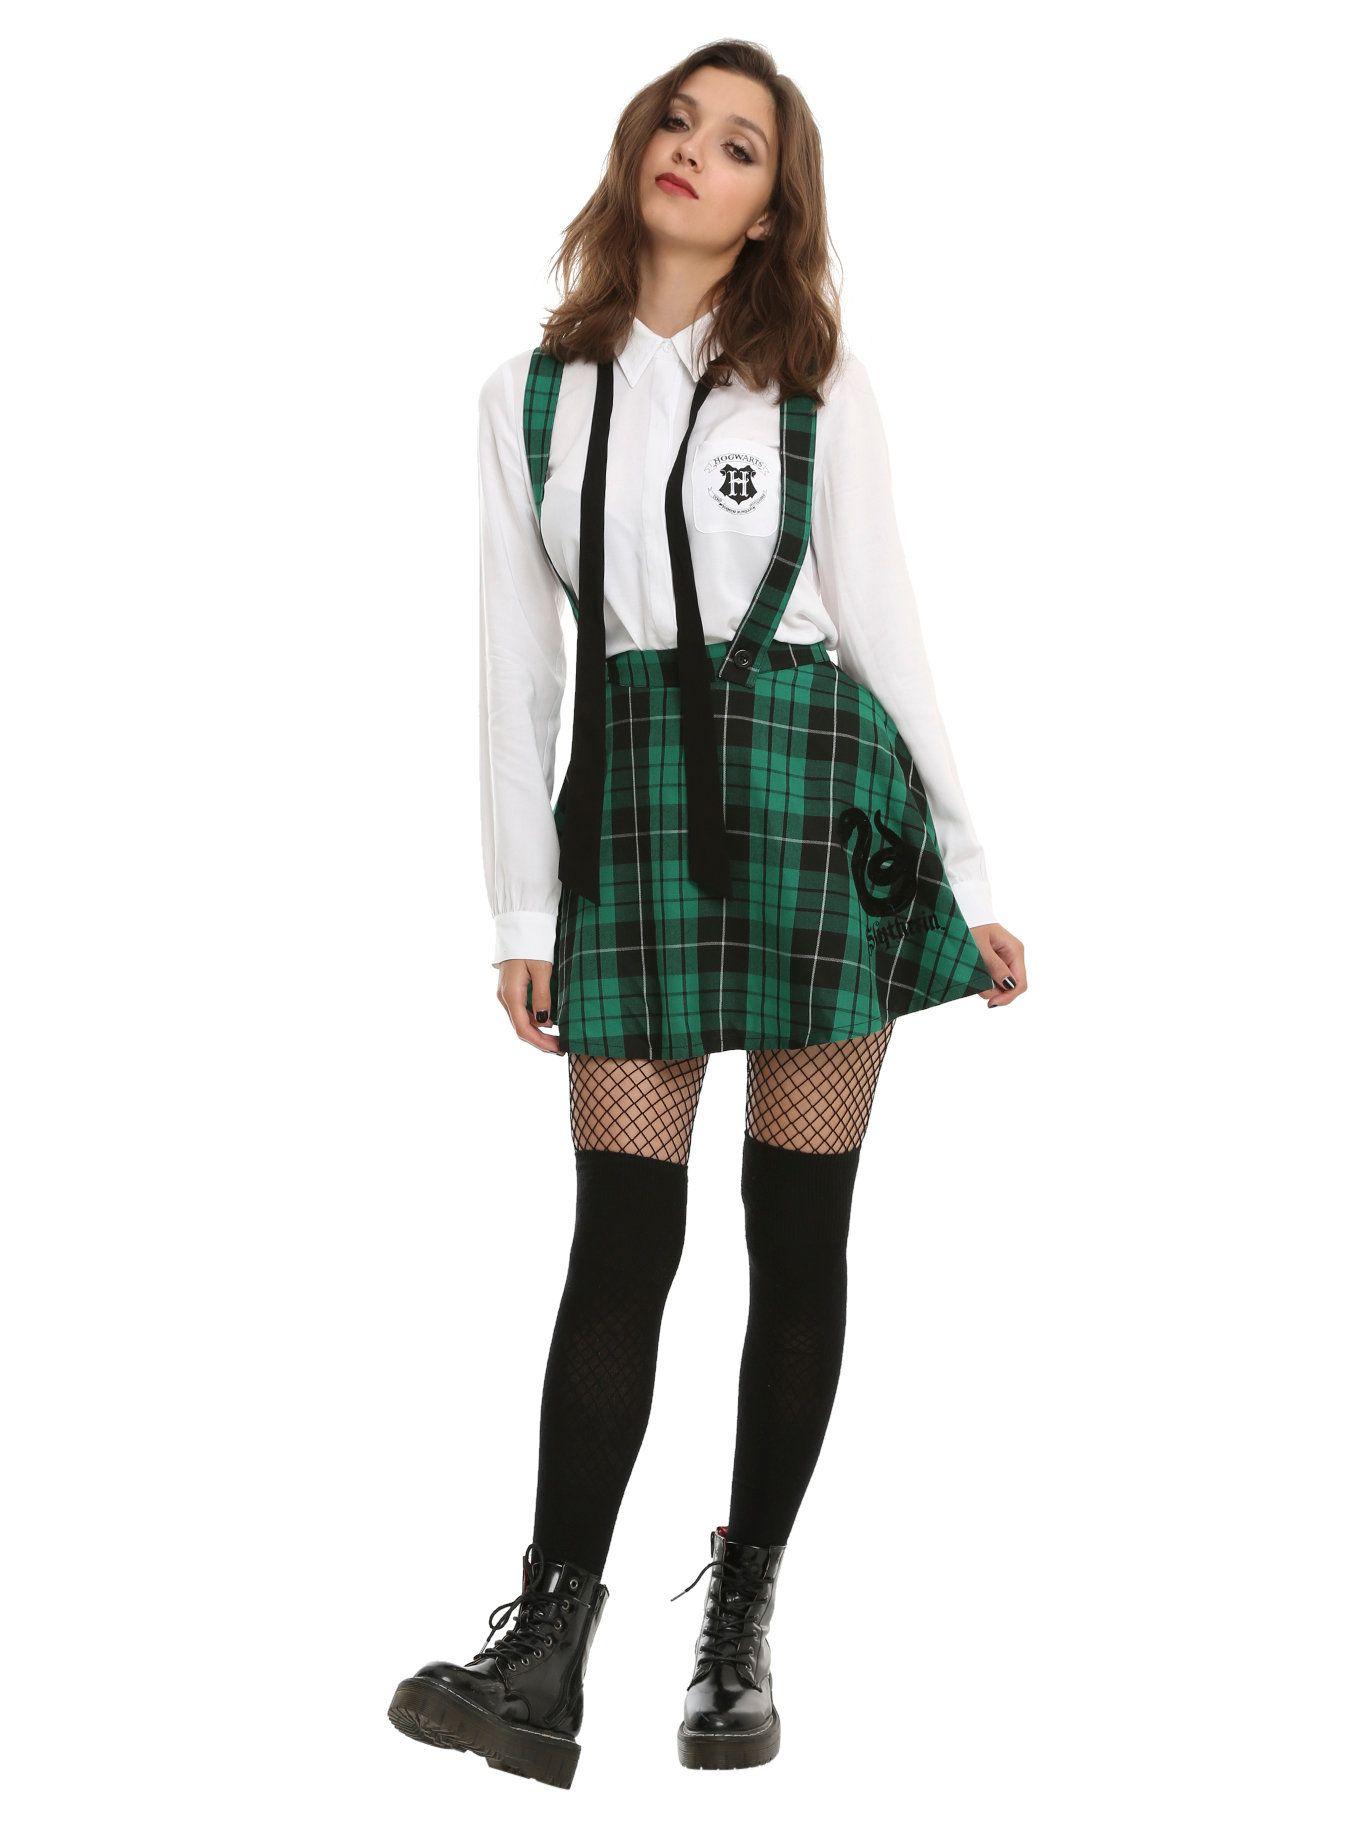 eb8eb2dc02 Harry Potter Slytherin School Skirt in 2019 | Halloween | Harry ...